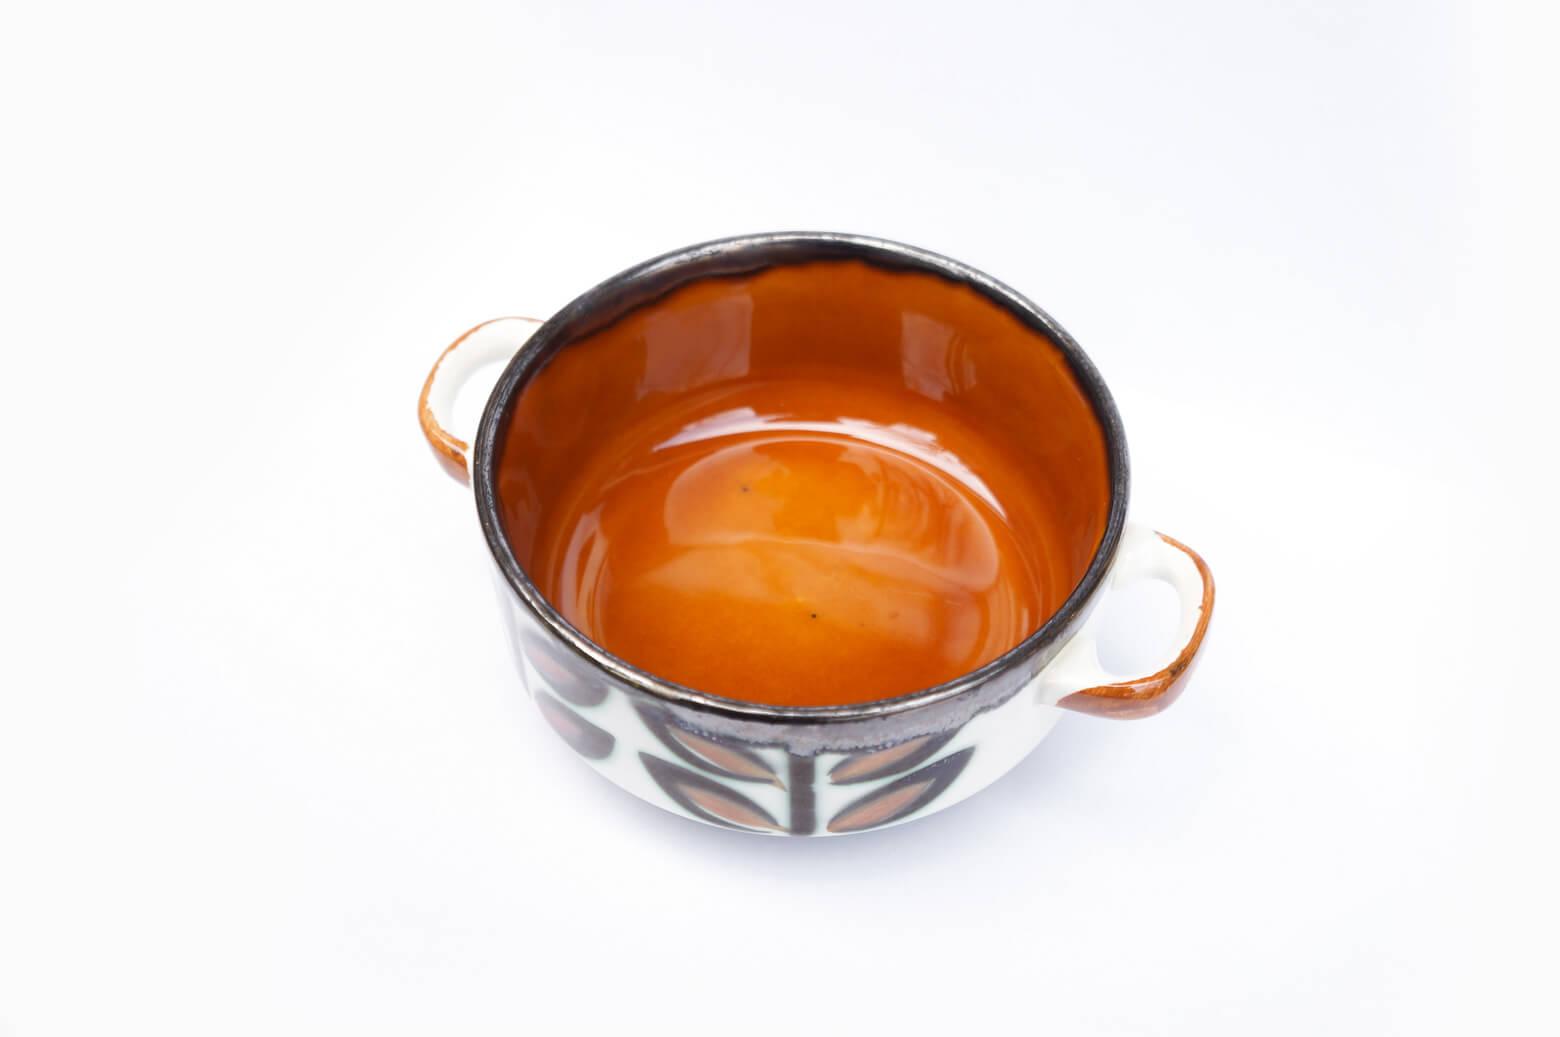 Boch Soup Bowl Rambouillet / ボッホ スープボウル ランブイエ ヴィンテージ 食器 ベルギー 雑貨 2